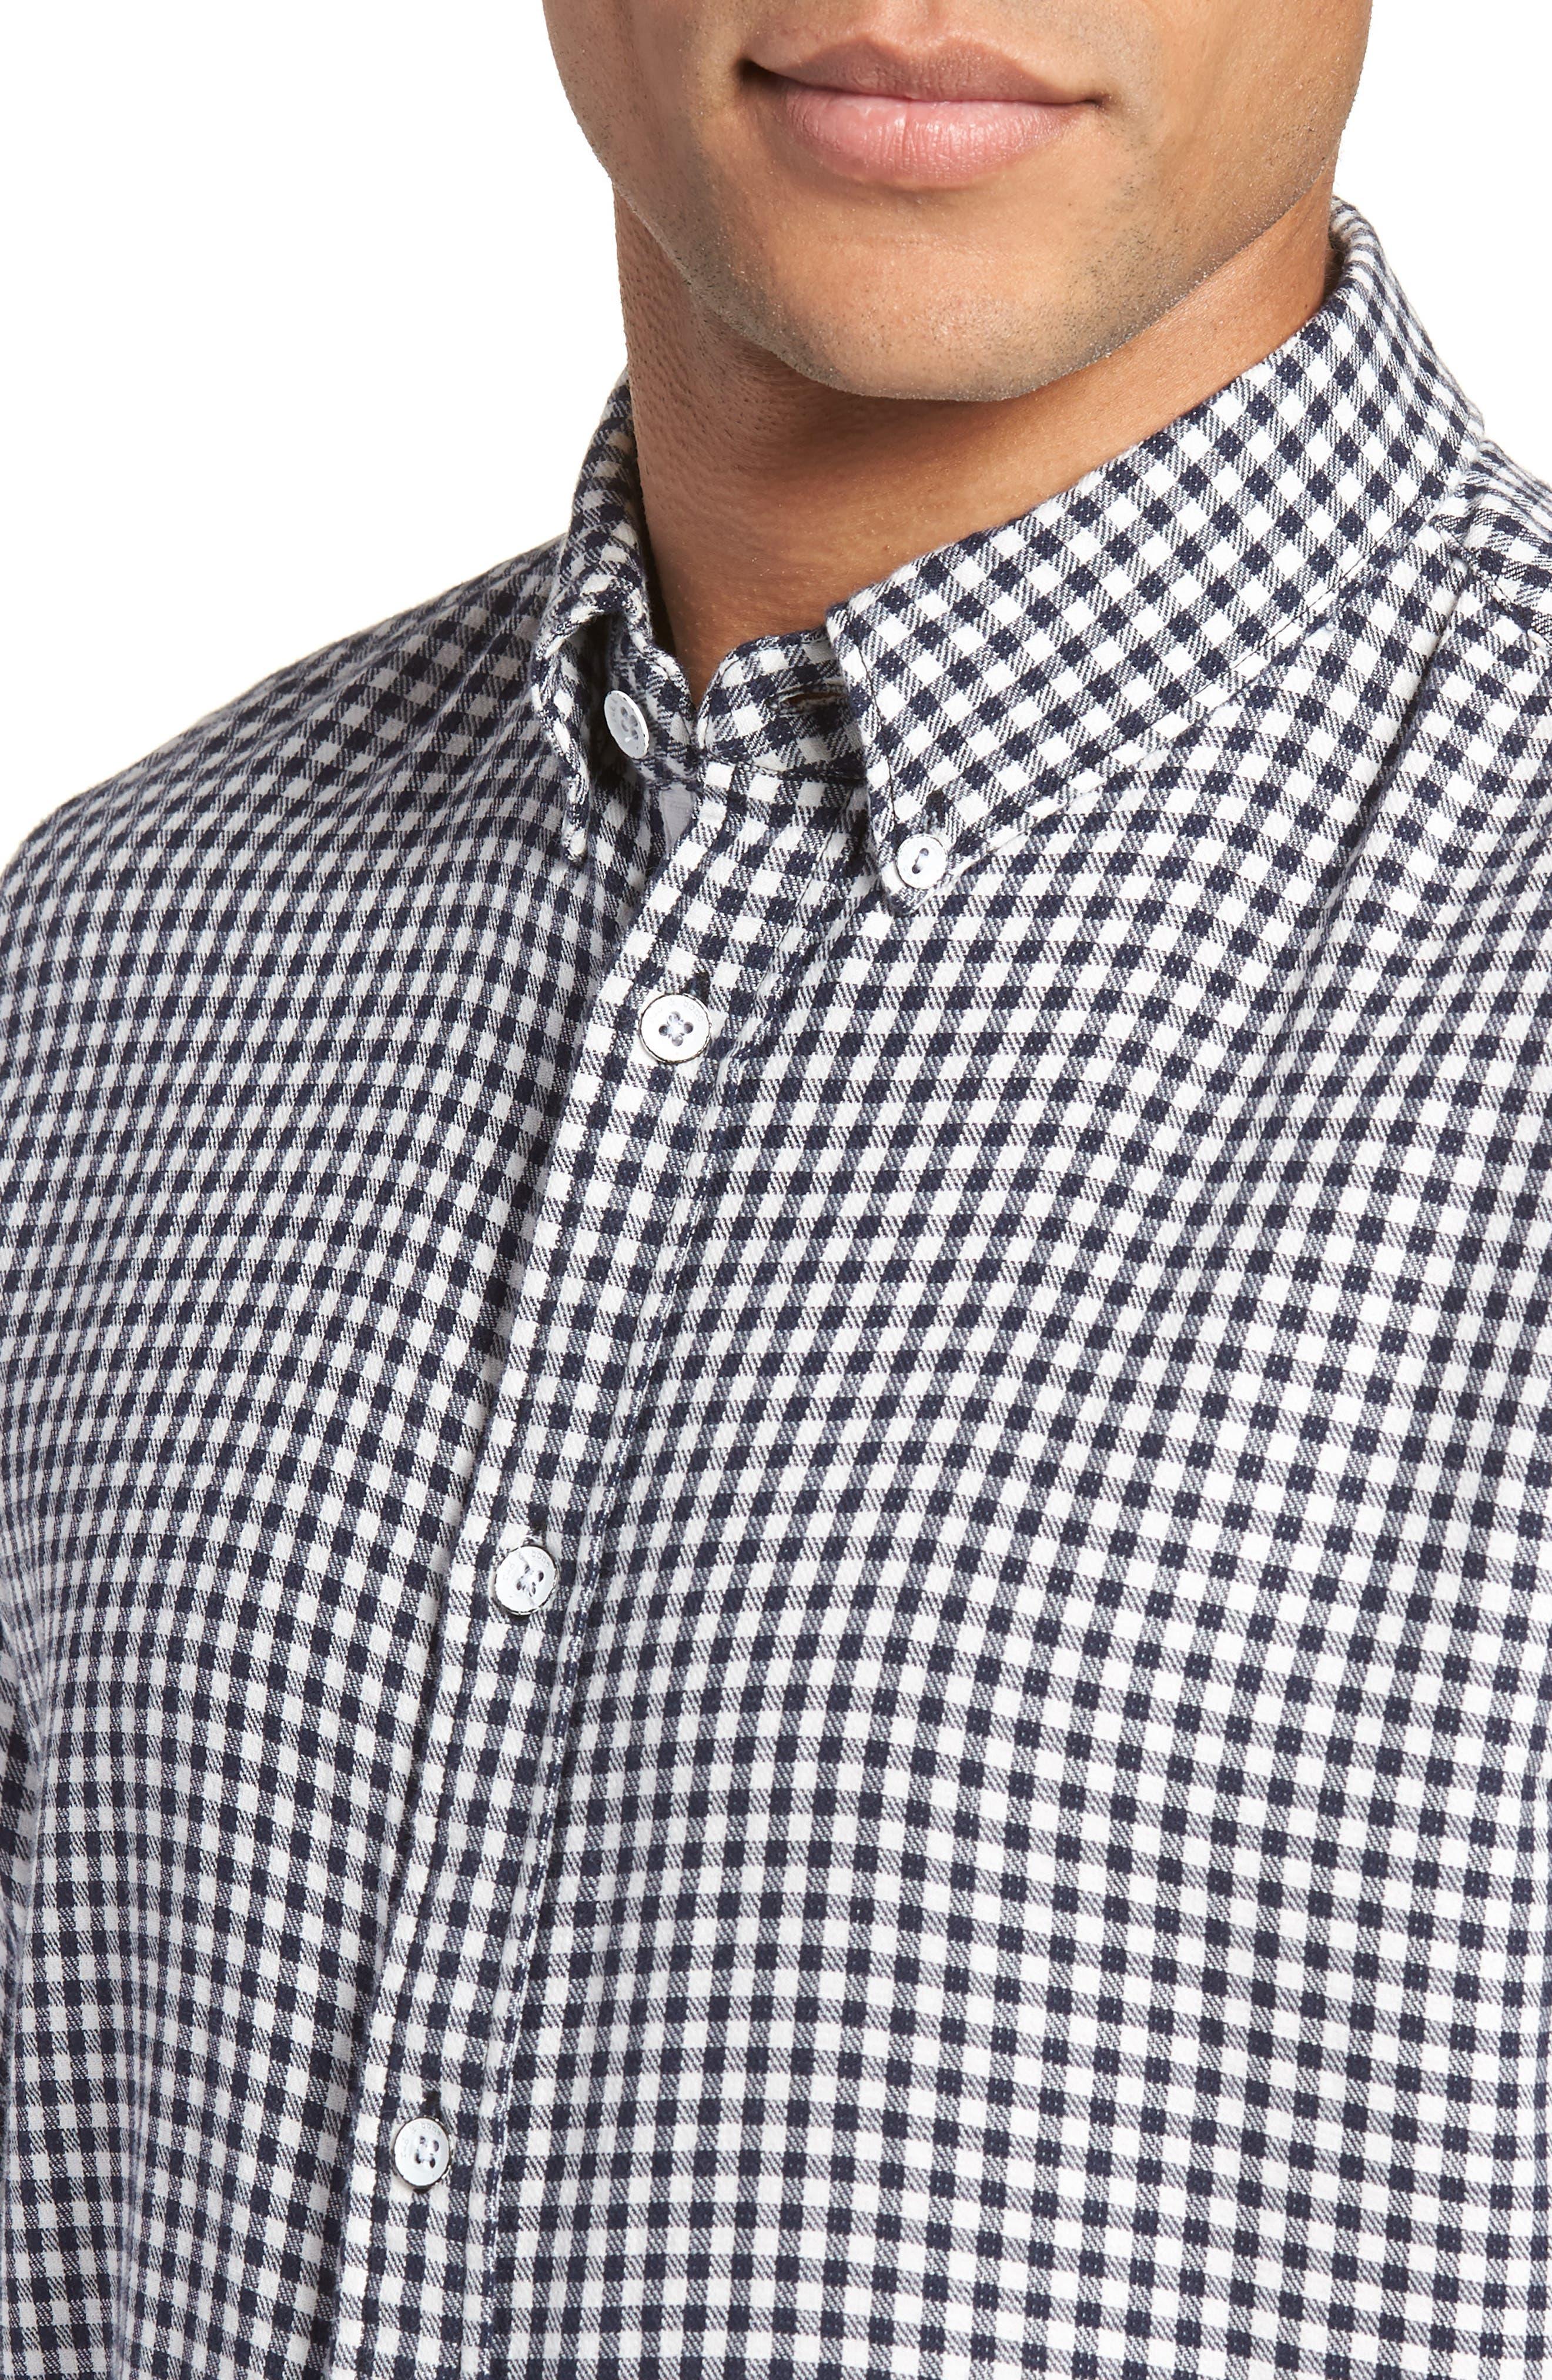 Fit 2 Tomlin Check Sport Shirt,                             Alternate thumbnail 2, color,                             Navy Gingham